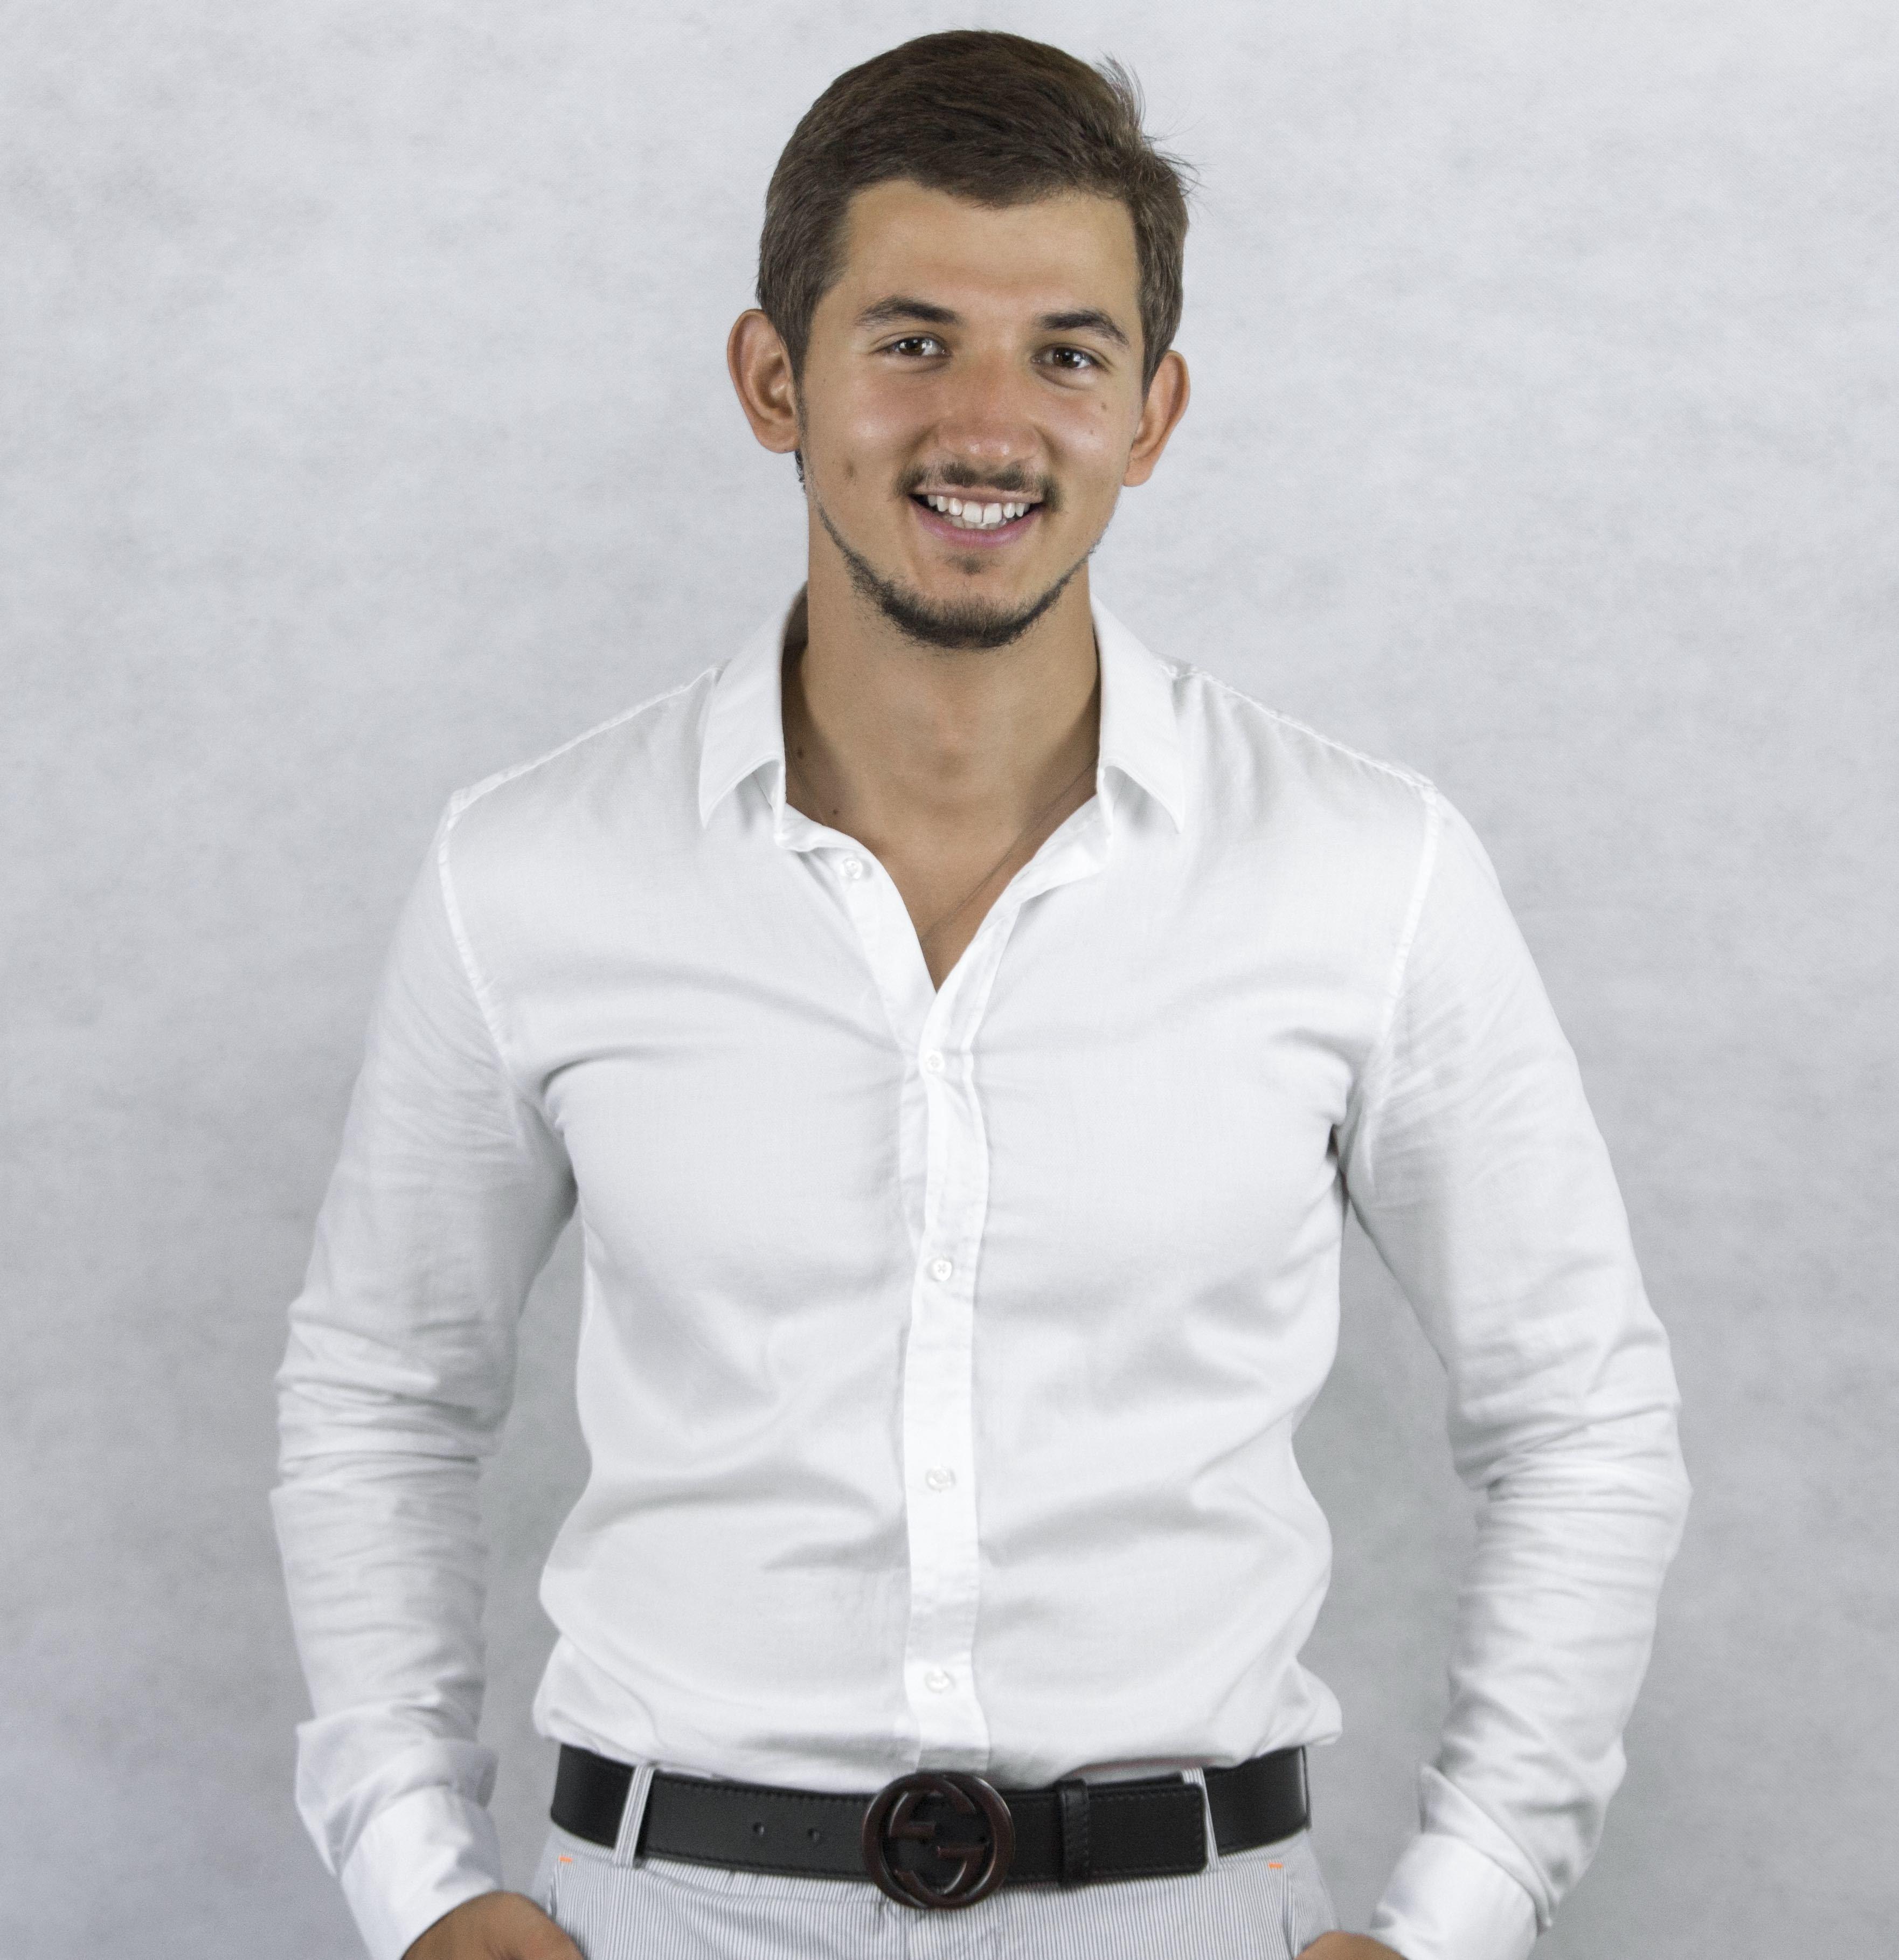 Kristiyan Uzunchev